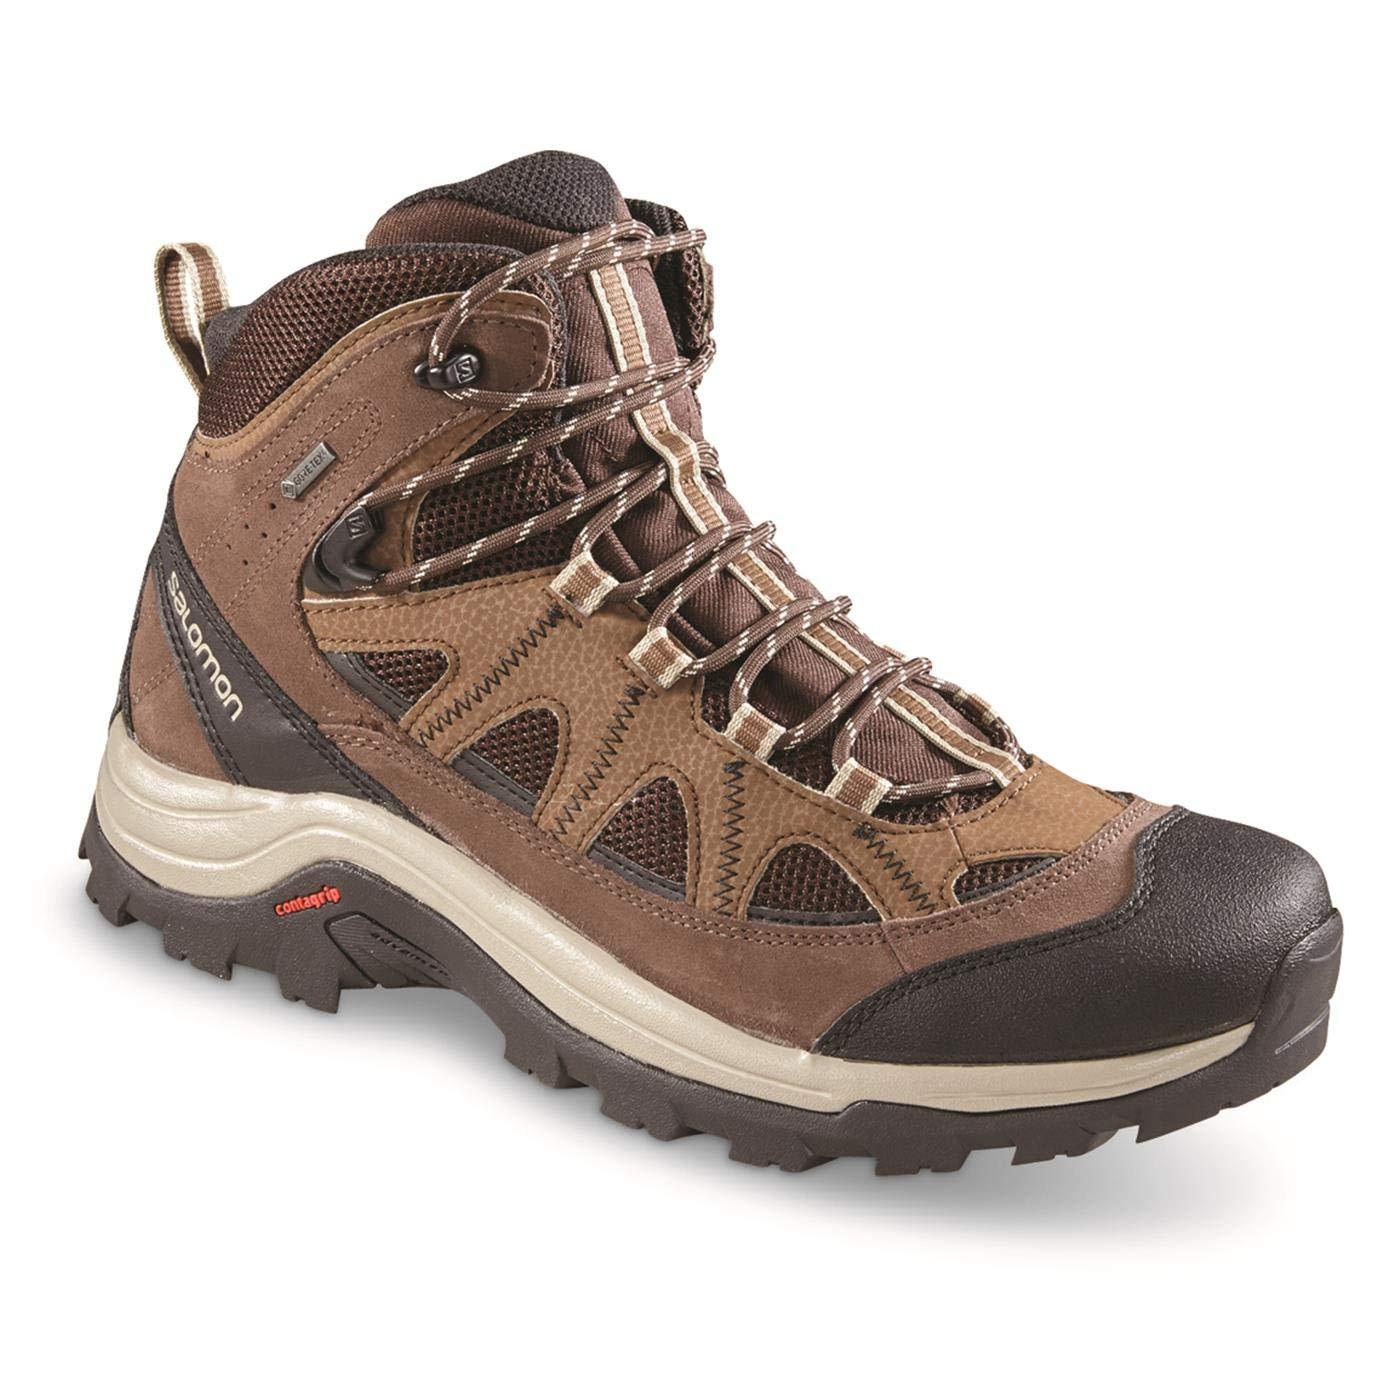 Salomon Mens Authentic LTR GTX Backpacking Boot Salomon Footwear AUTHENTIC LTR GTX®-M